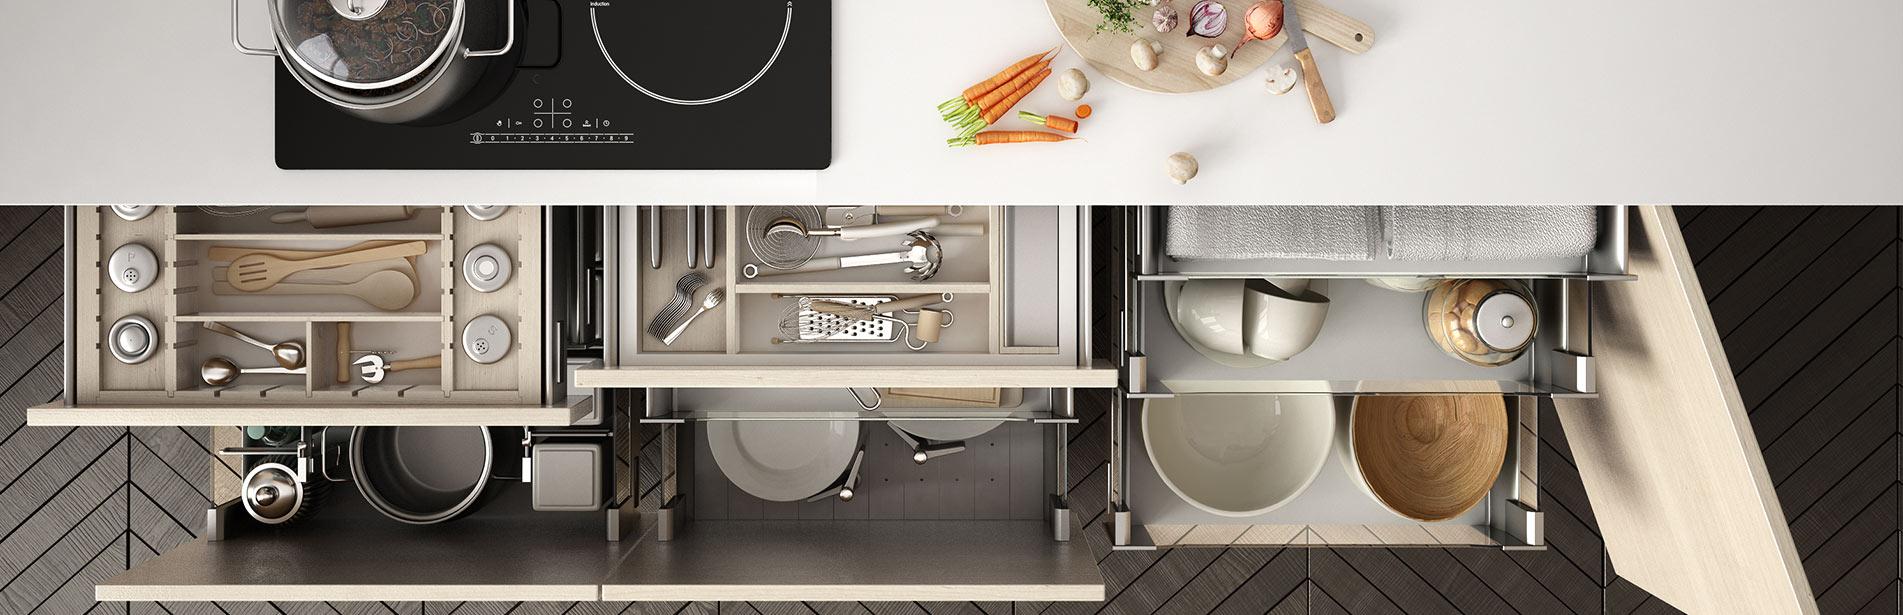 Custom Kitchen And Bathroom Cabinets In Phoenix Az